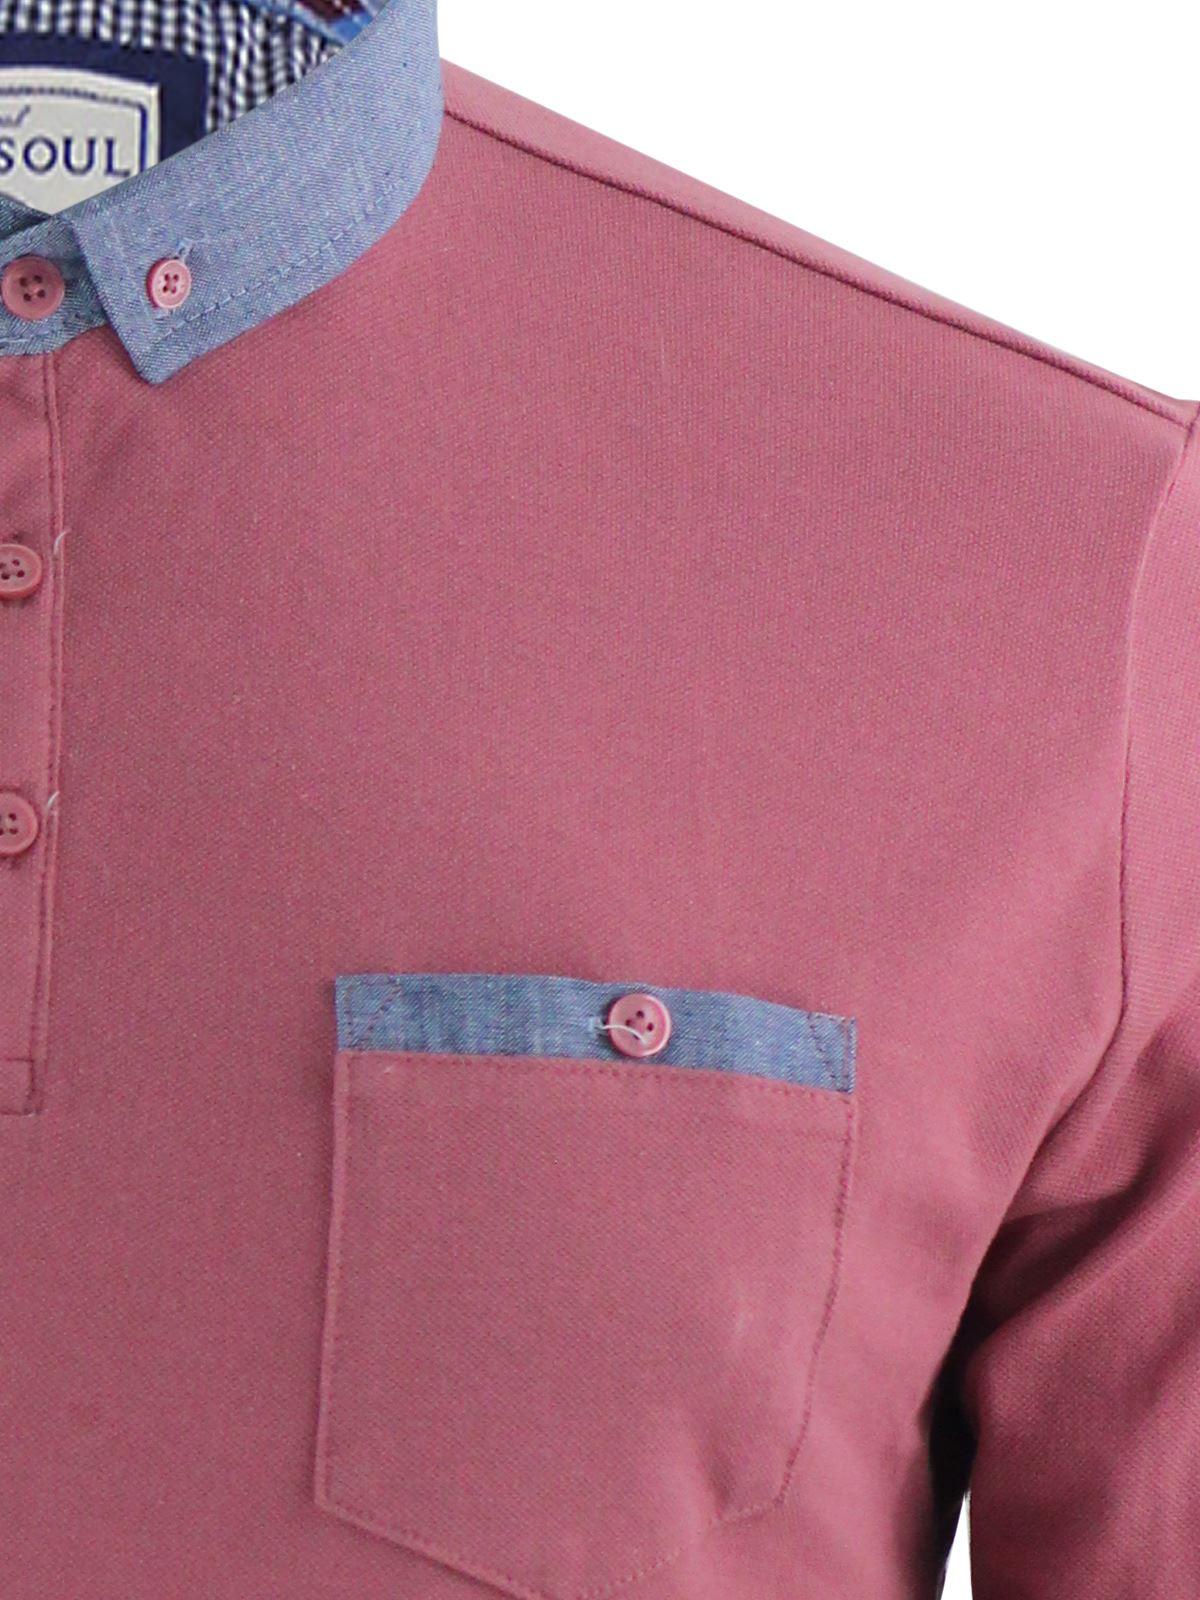 thumbnail 22 - Mens-Polo-T-Shirt-Brave-Soul-Hera-Cotton-Long-Sleeve-Casual-Top